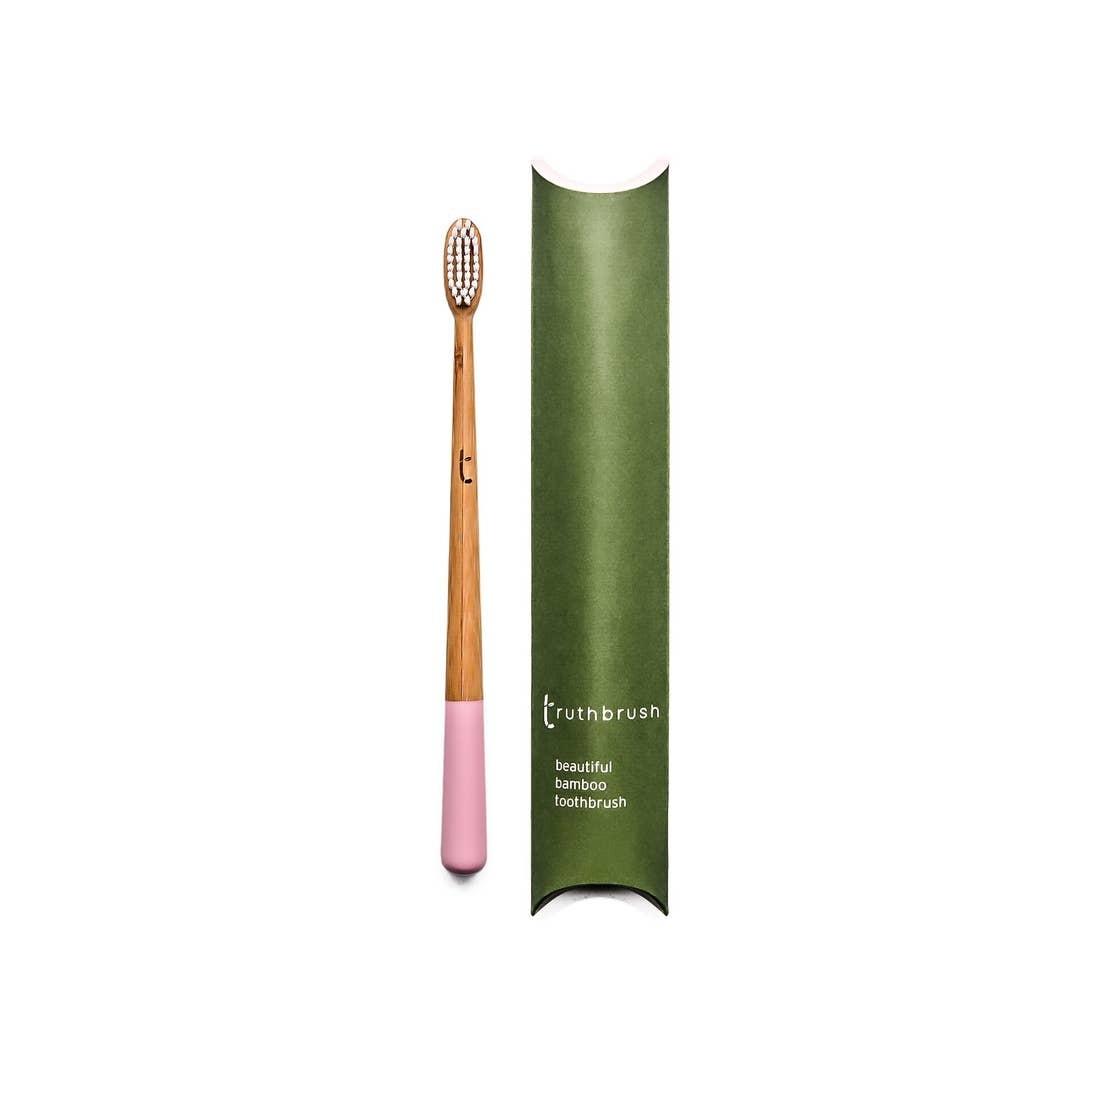 Adult Bristle Truthbrush - Medium - Pink